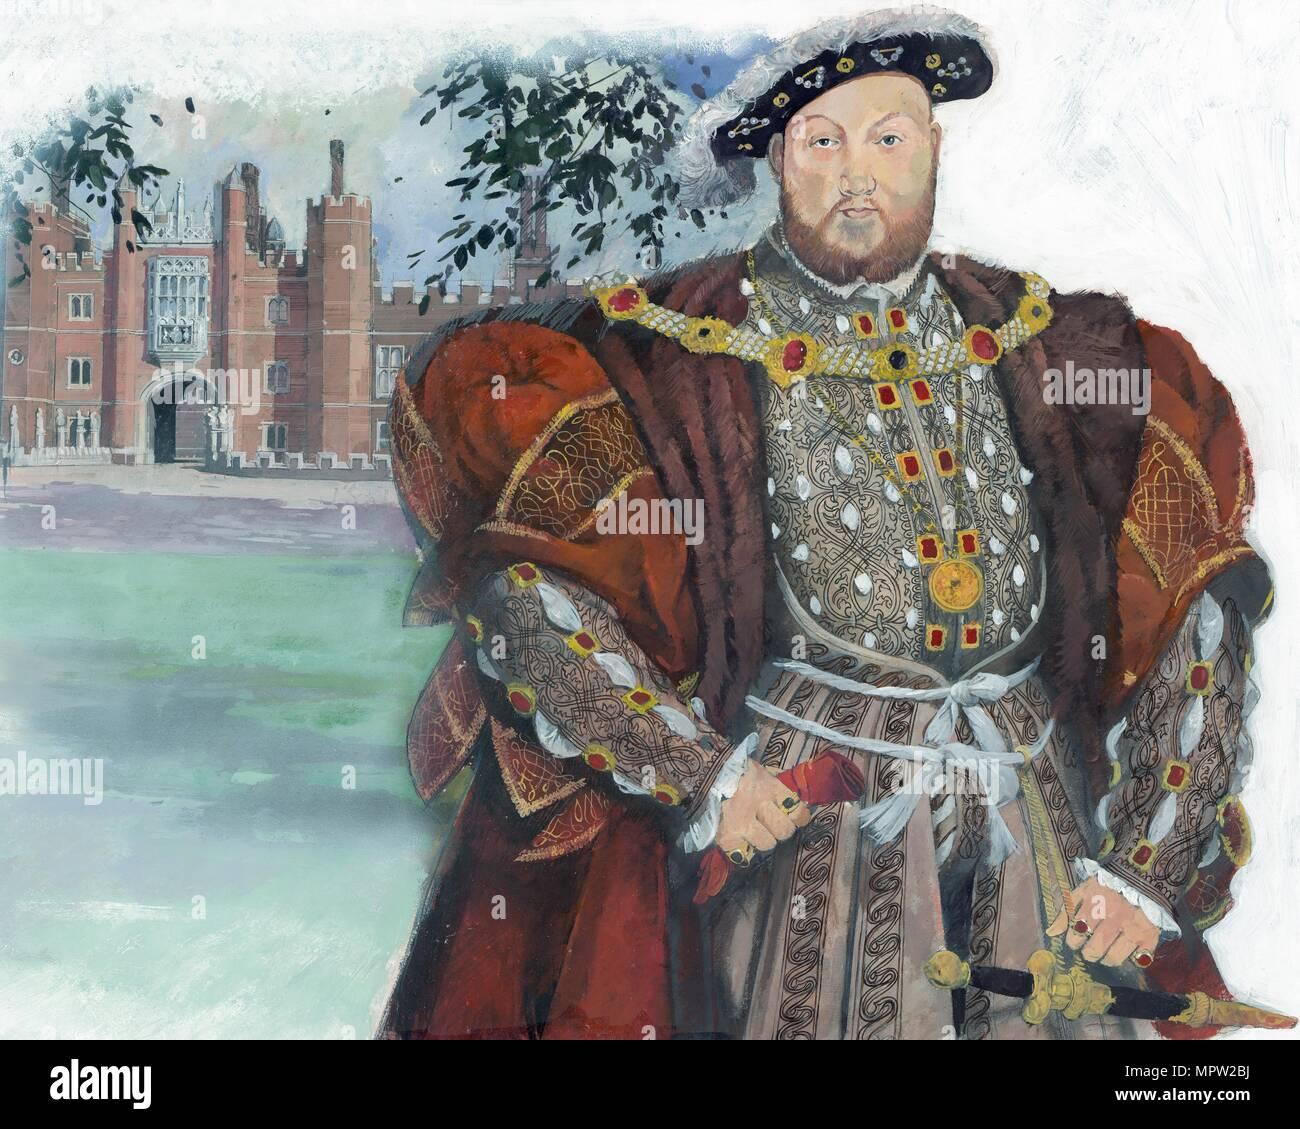 Henry VIII, King of England, 1990s. Artist: Ivan Lapper. - Stock Image